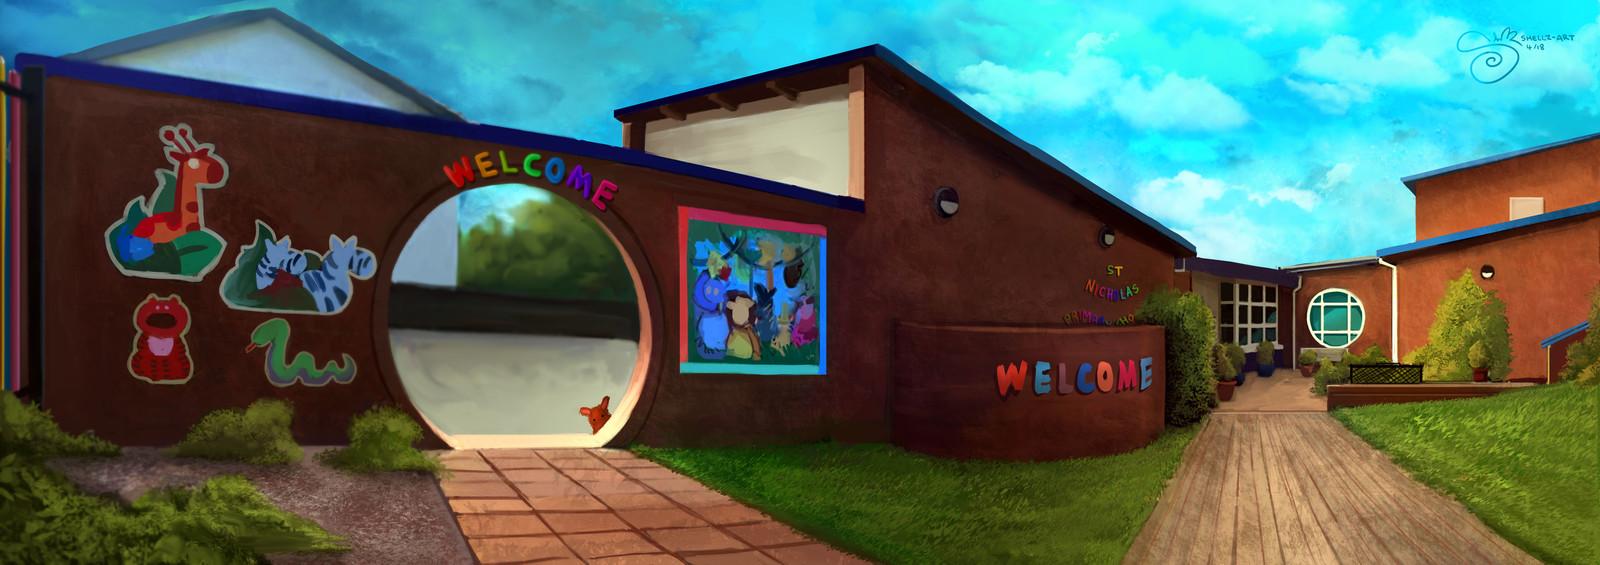 St. Nicholas' Primary School